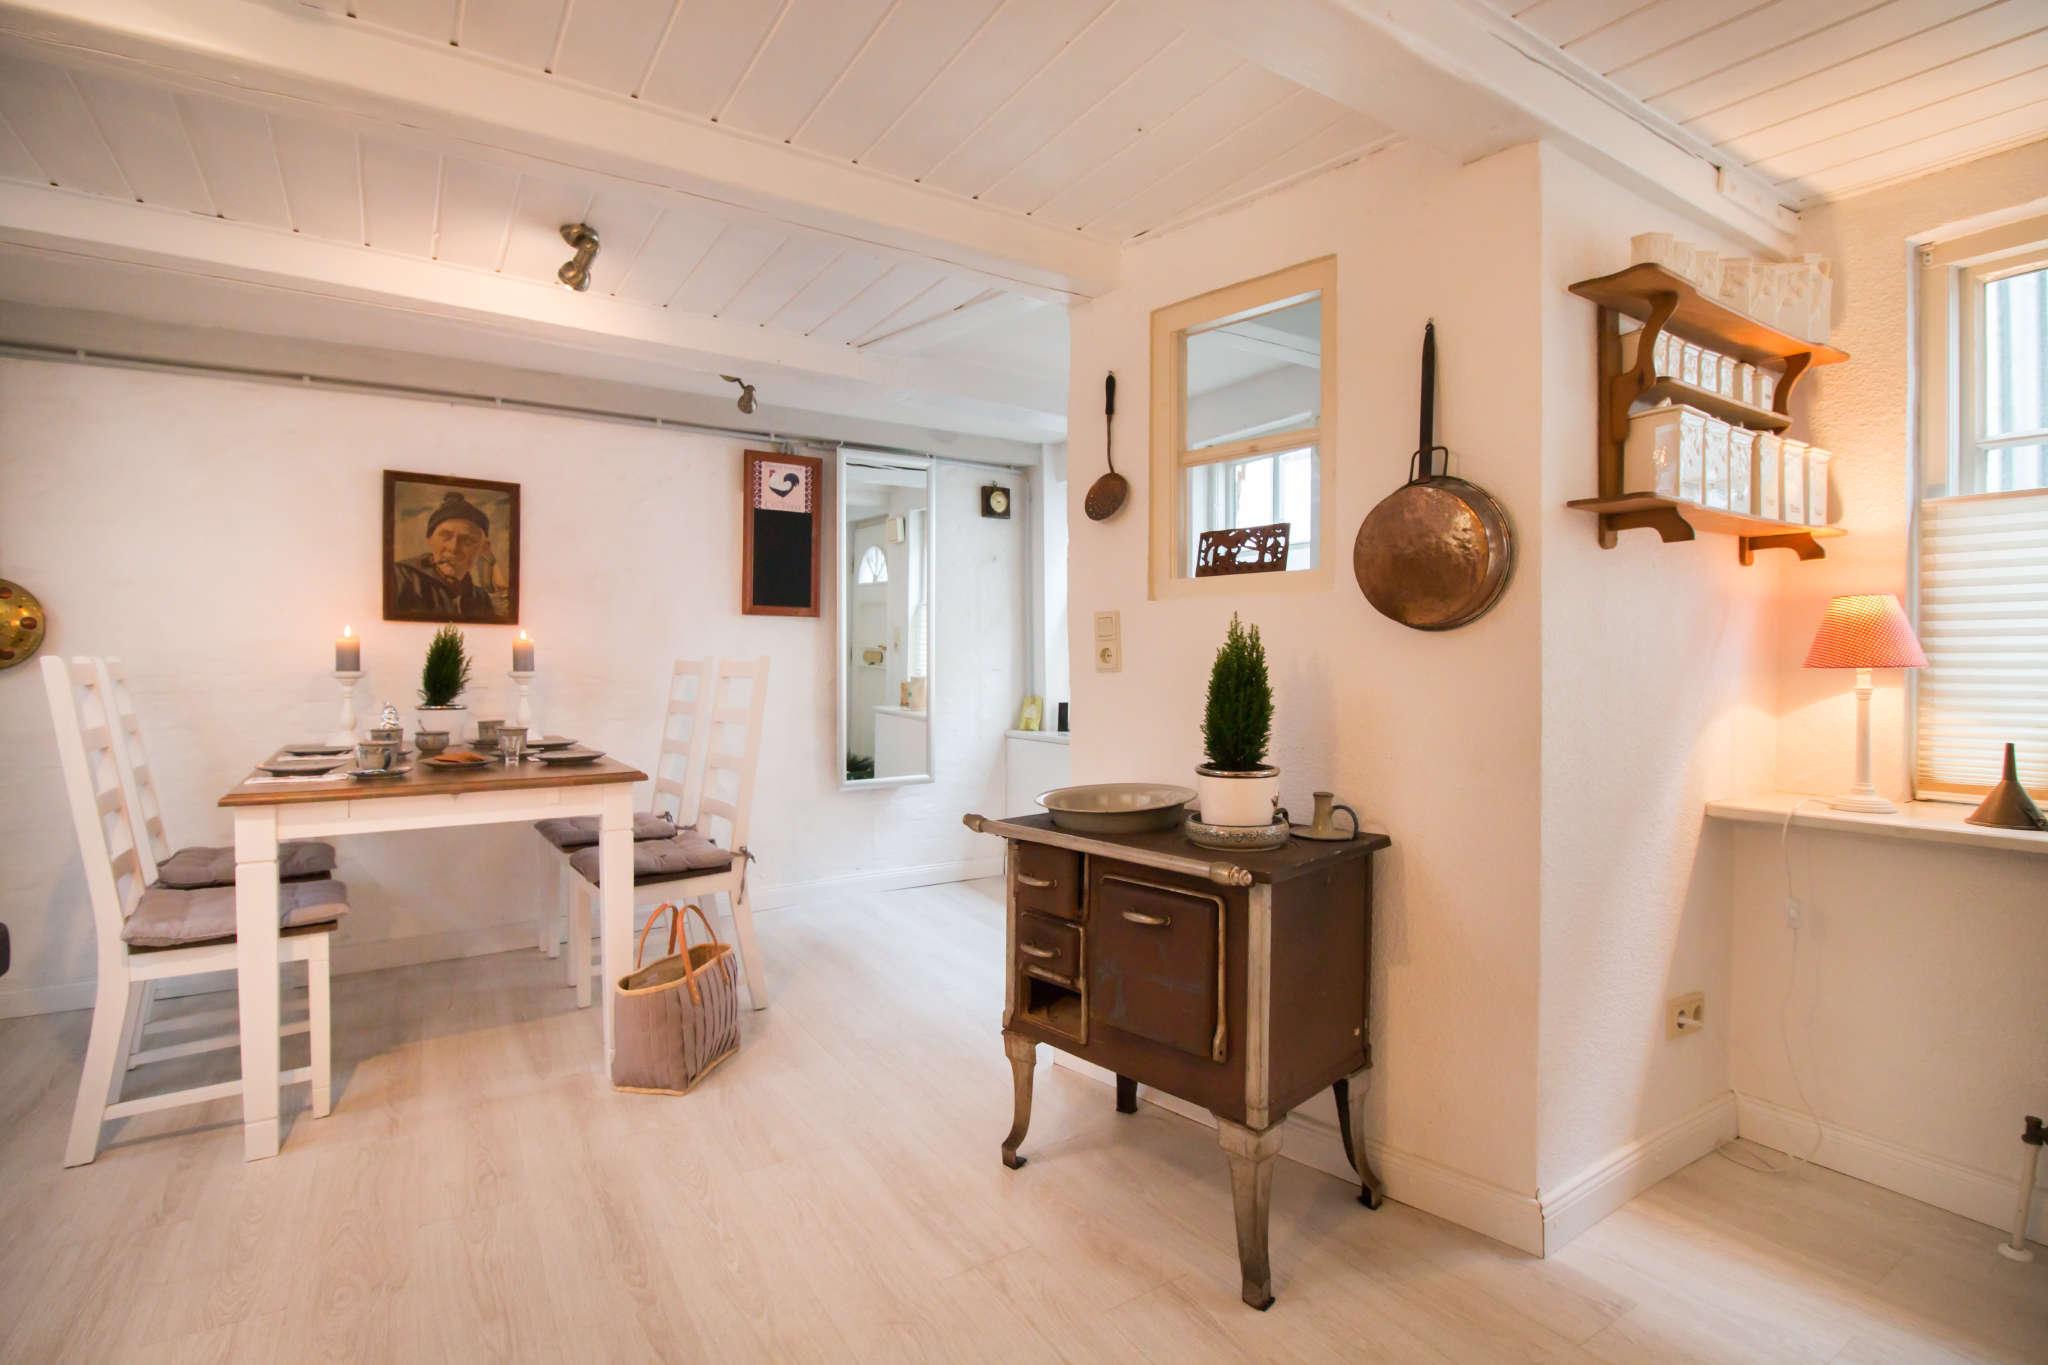 ferienhaus 39 nis puk 39 hyggelig l tt in flensburg schleswig holstein g nter blankenagel. Black Bedroom Furniture Sets. Home Design Ideas